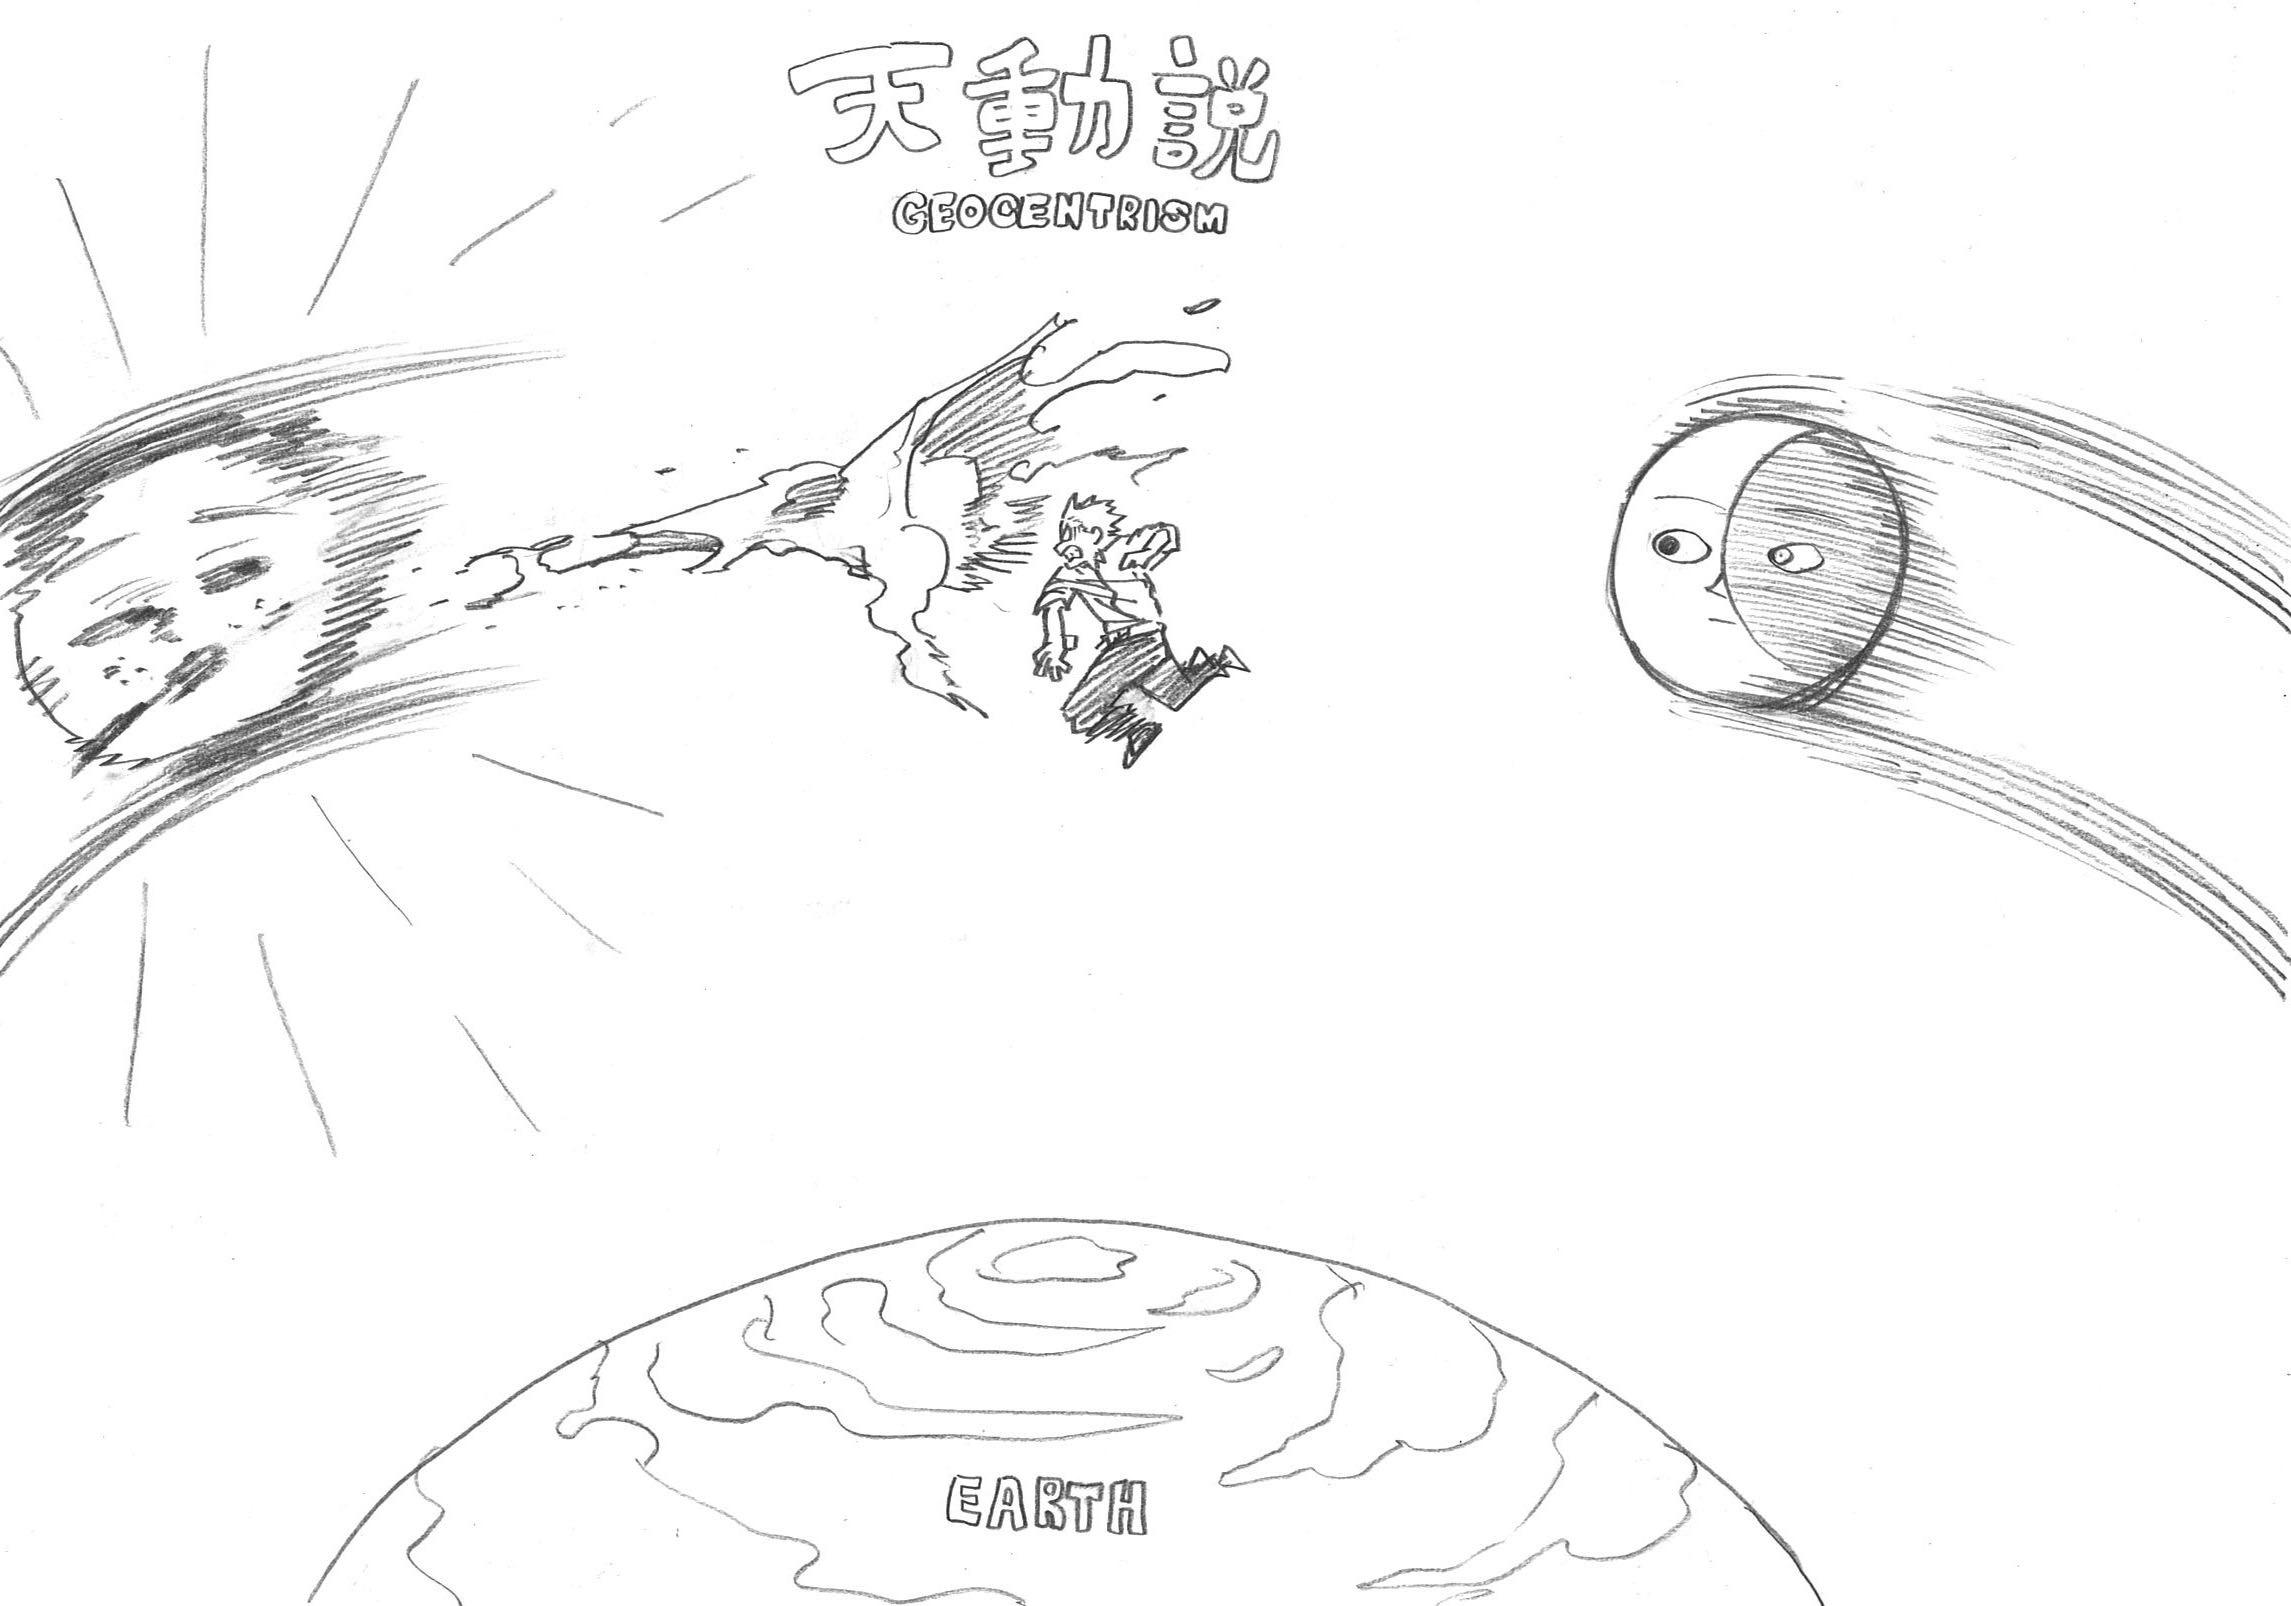 SunMido Bakugo and Moonroki